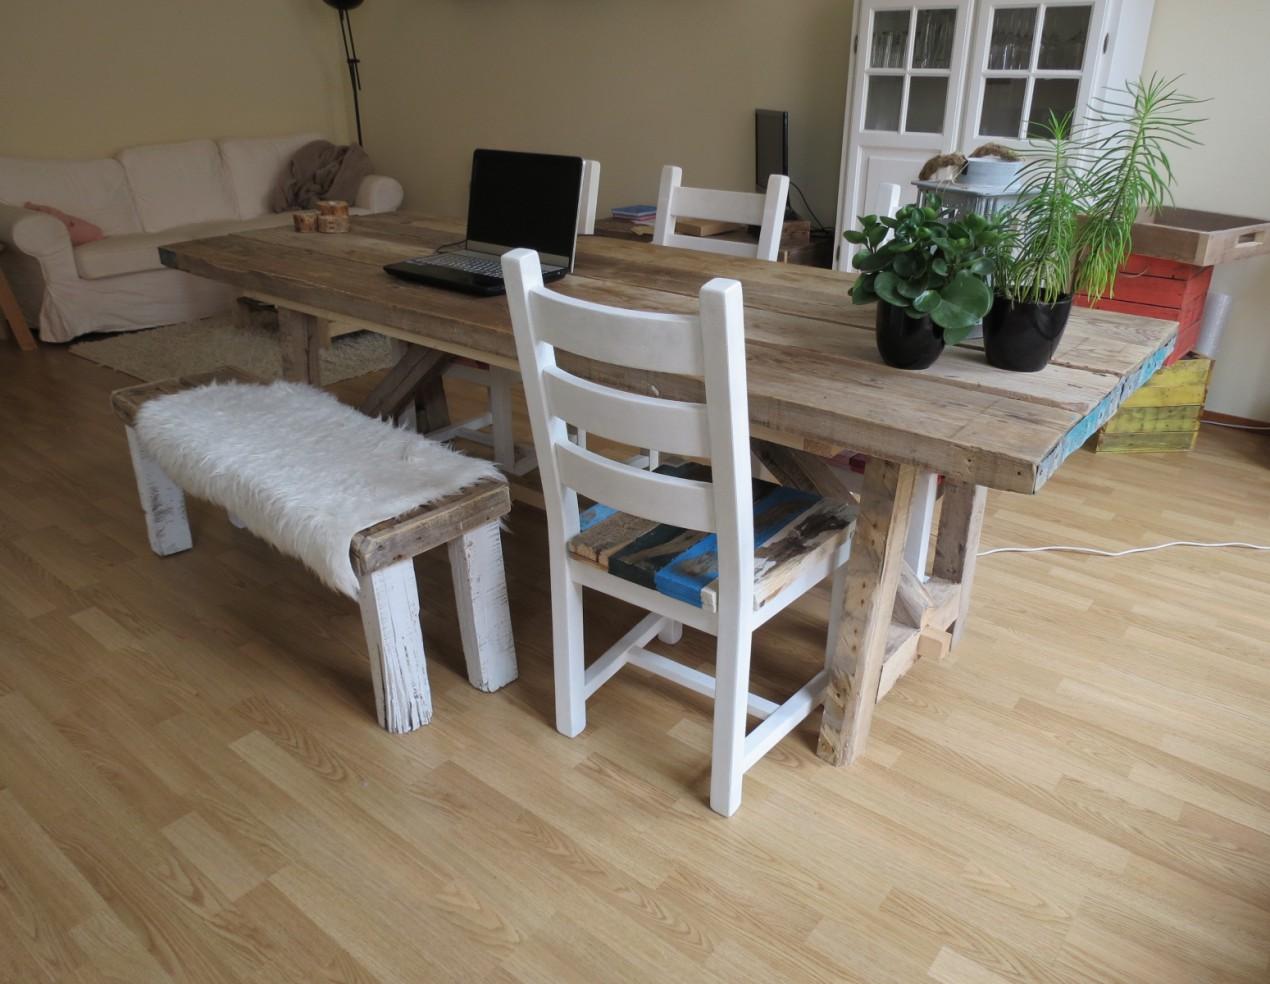 Grote Houten Tafels : Grote houten tafel grof houten tafel cm specialist in teak